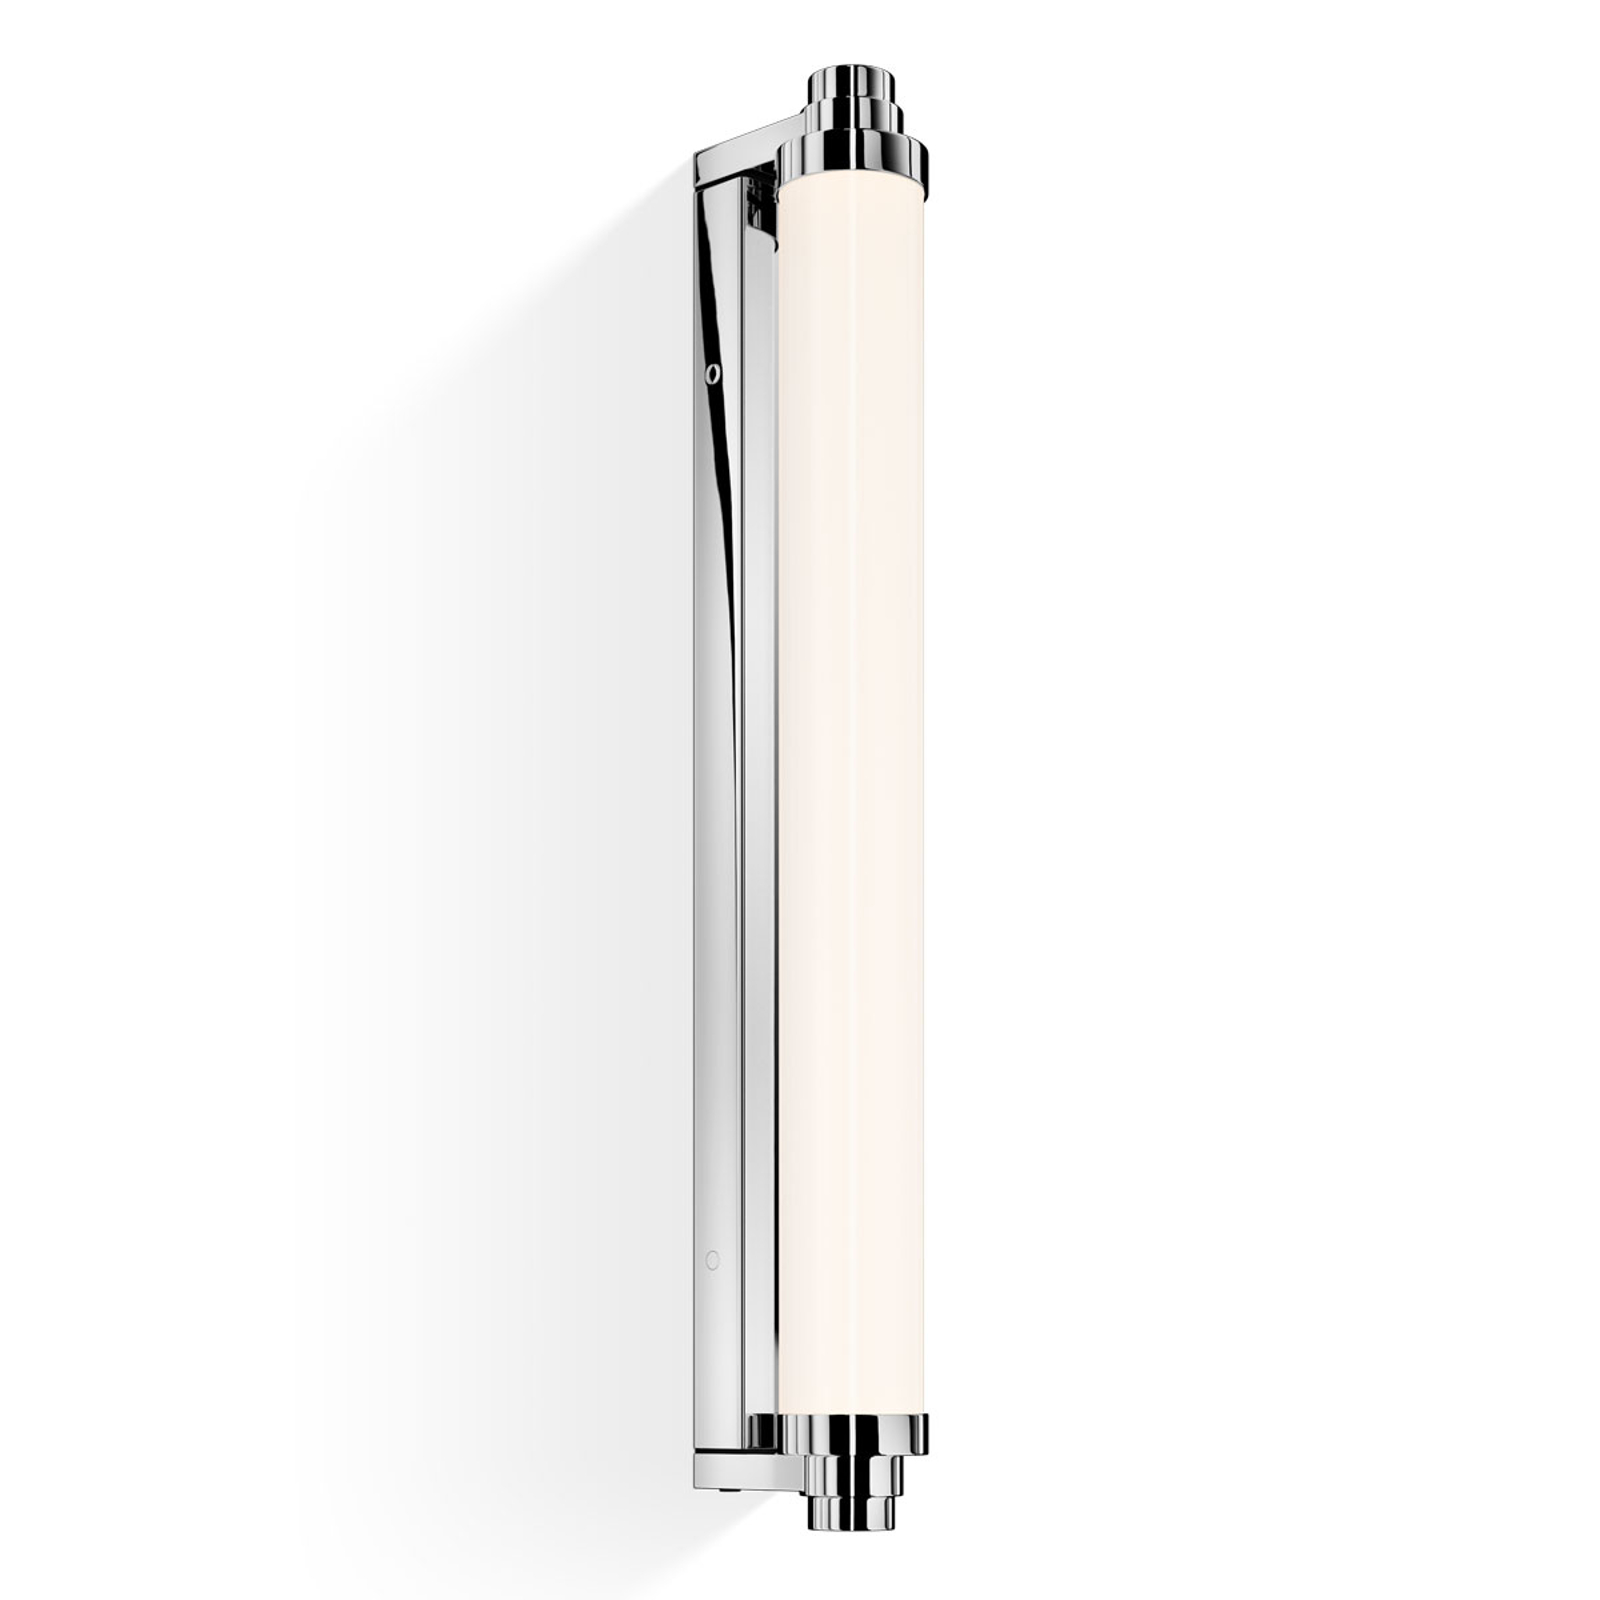 Decor Walther Vienna wandlamp 60 cm